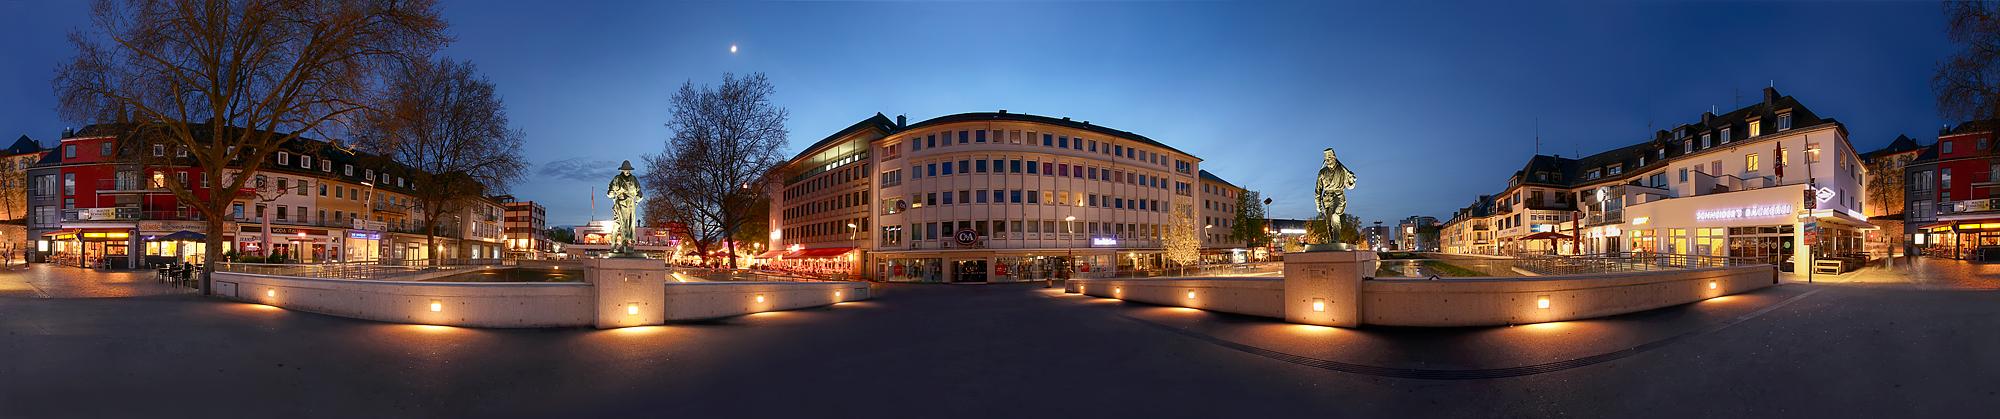 Siegen-Panorama